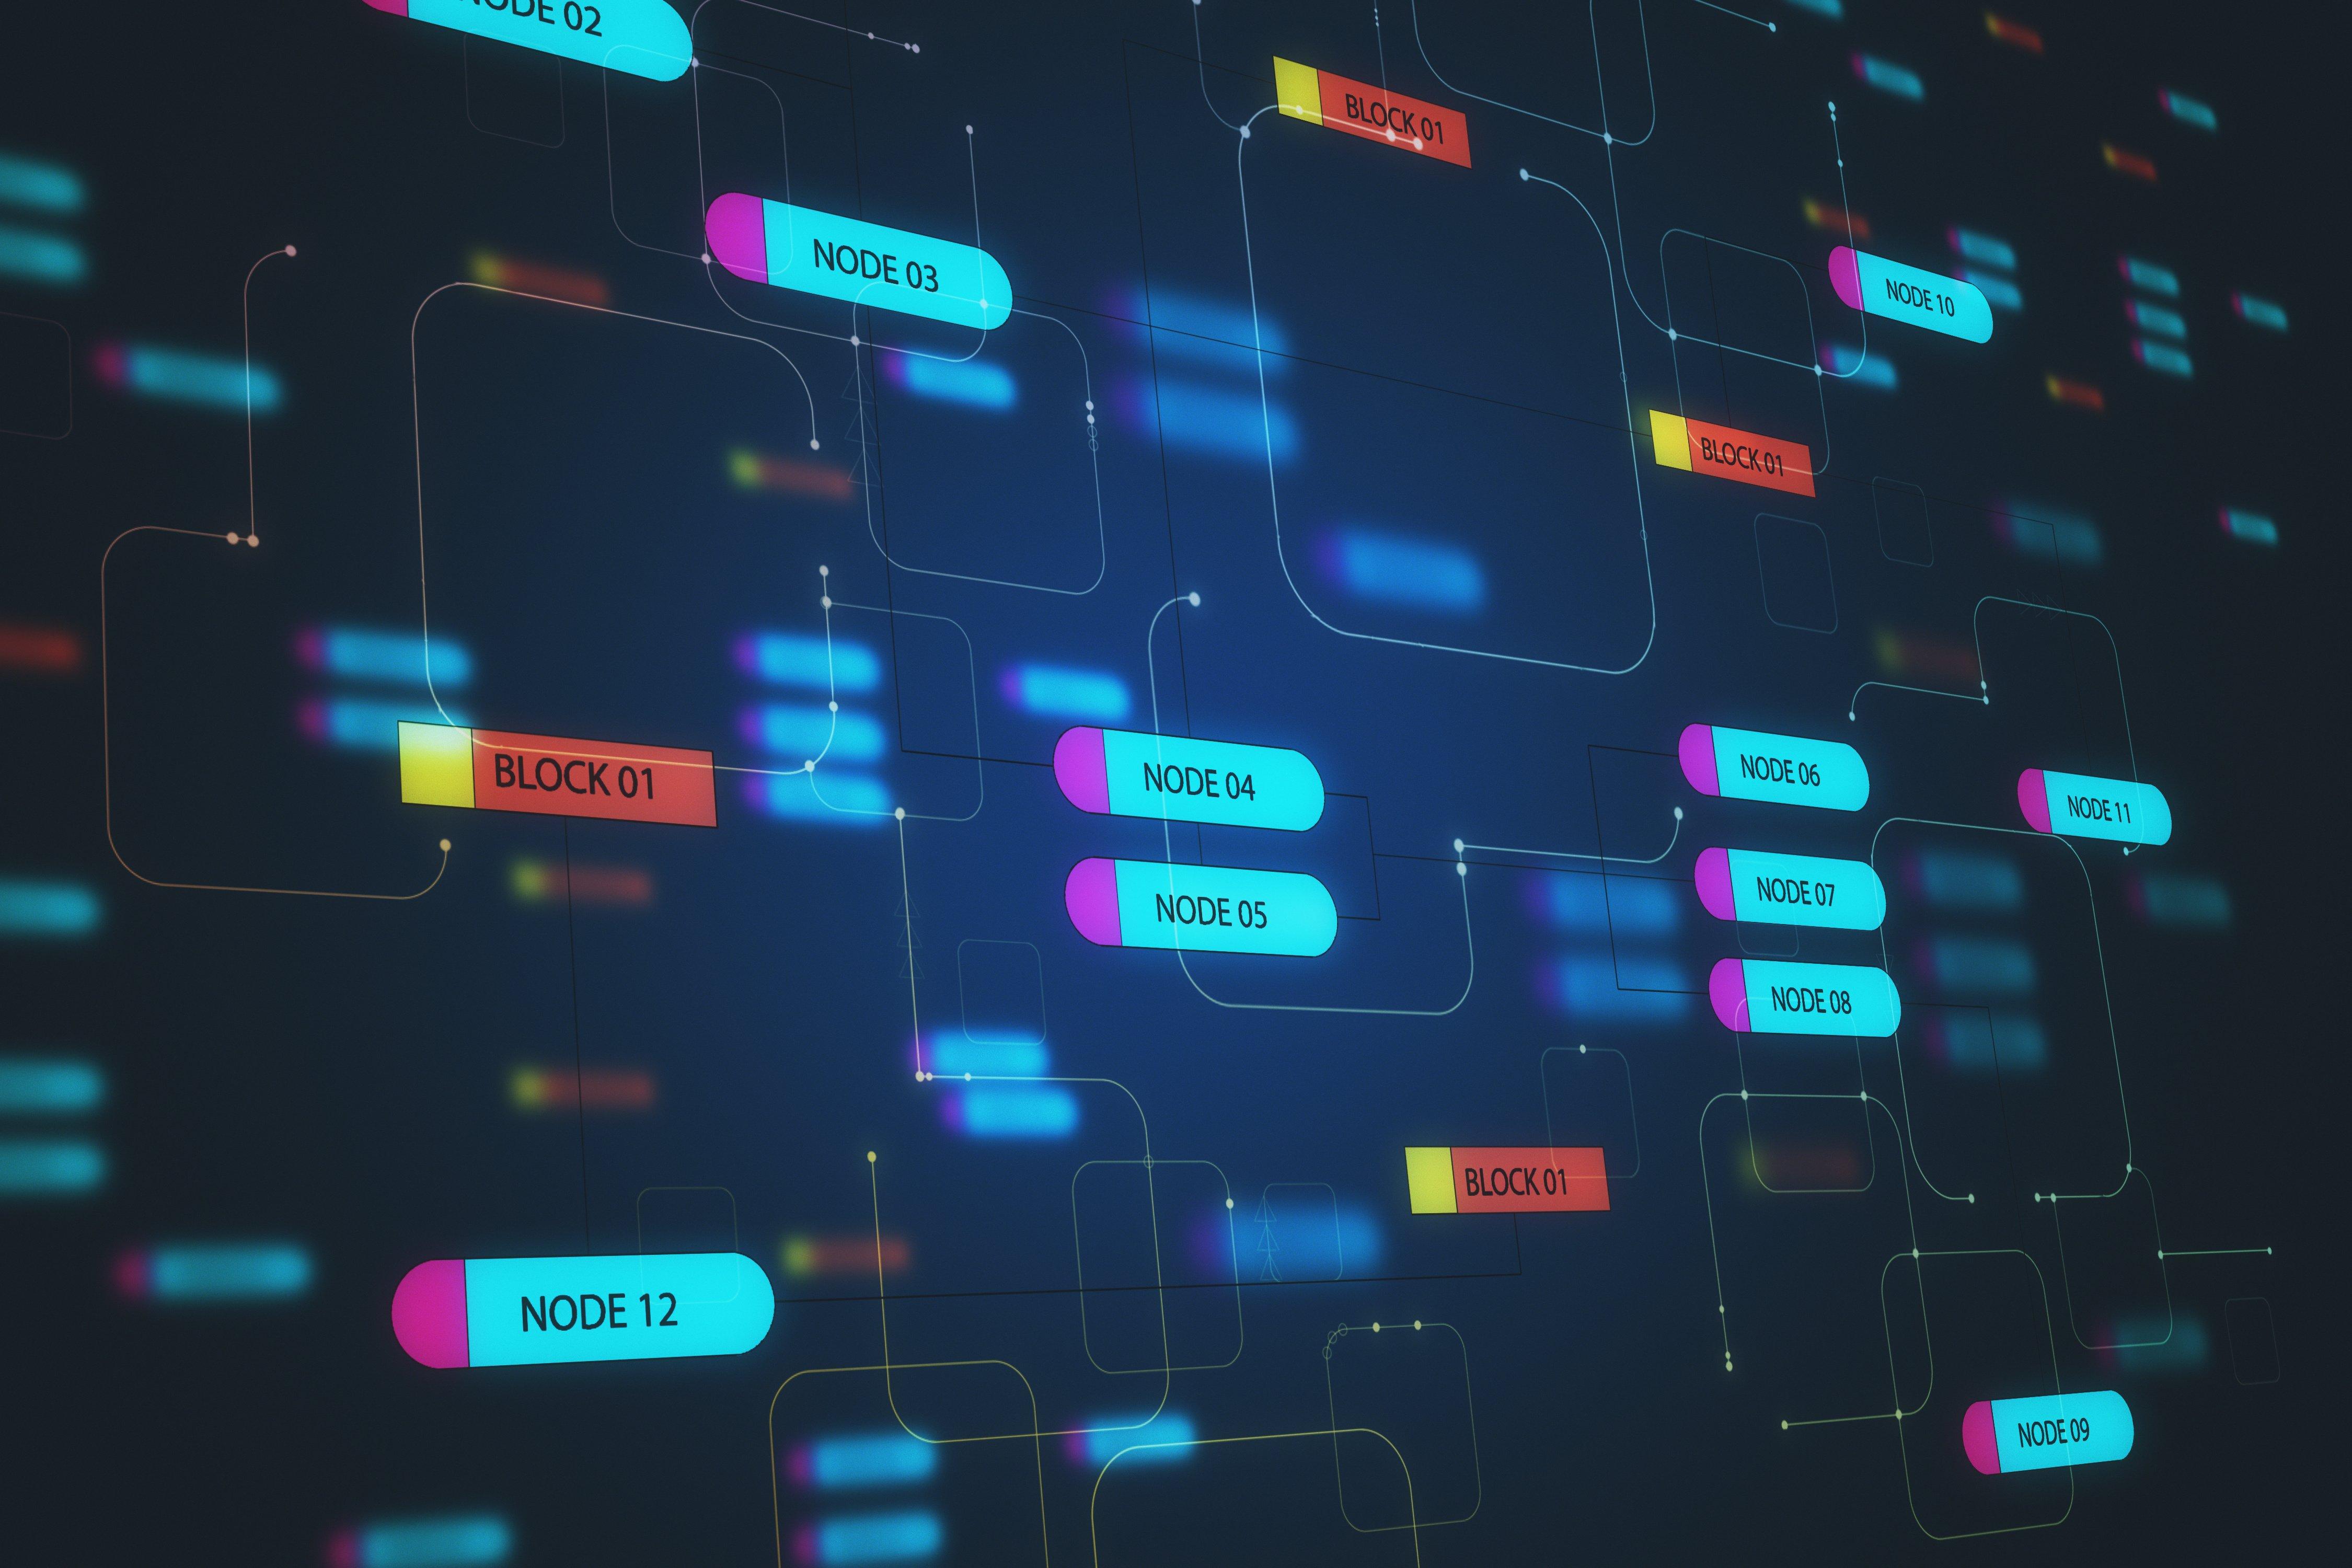 Nodes, Data Analytics, Knowledge Studio